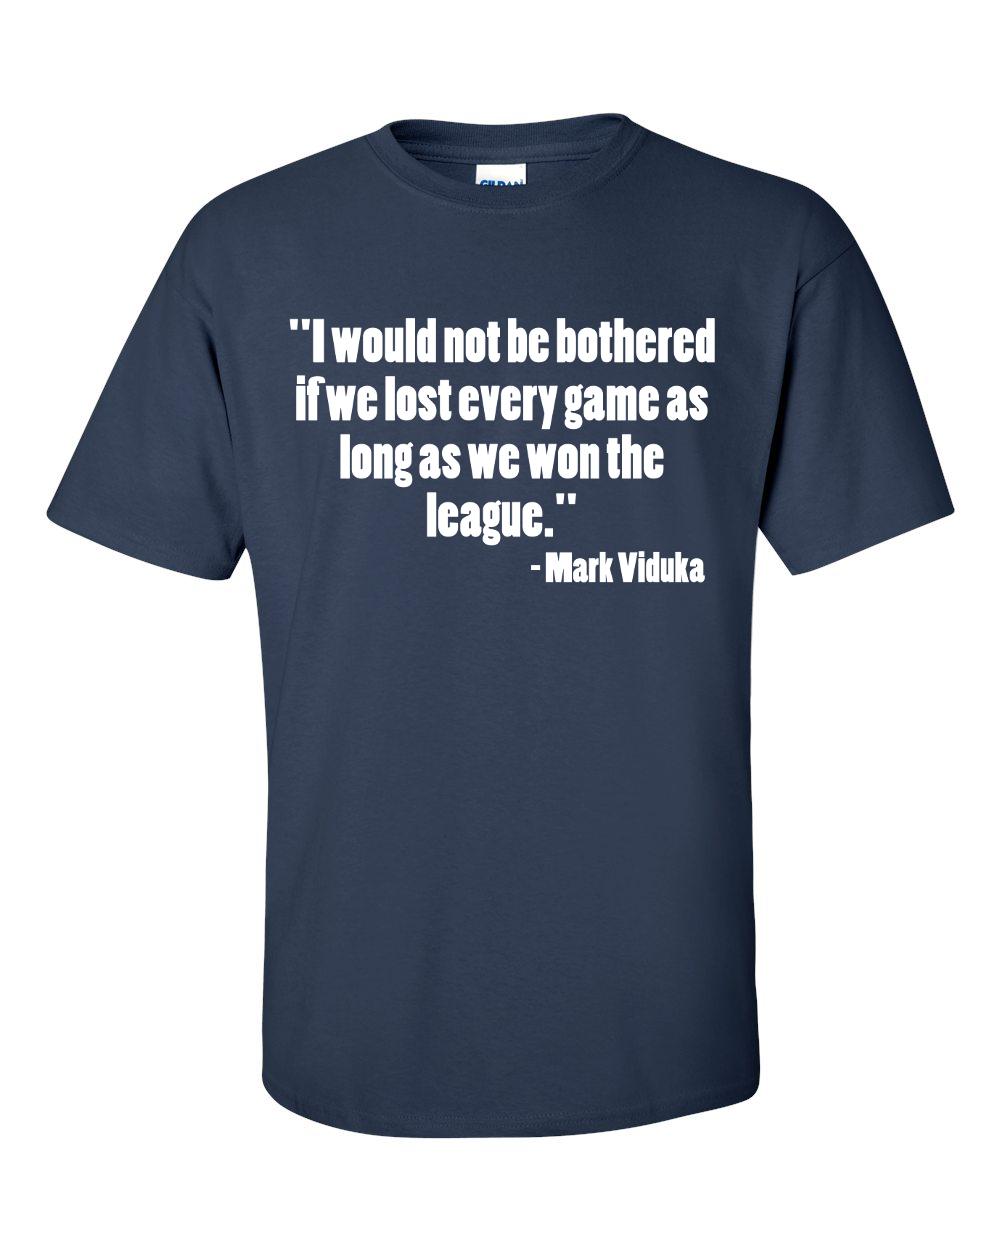 Mark Viduka's quote